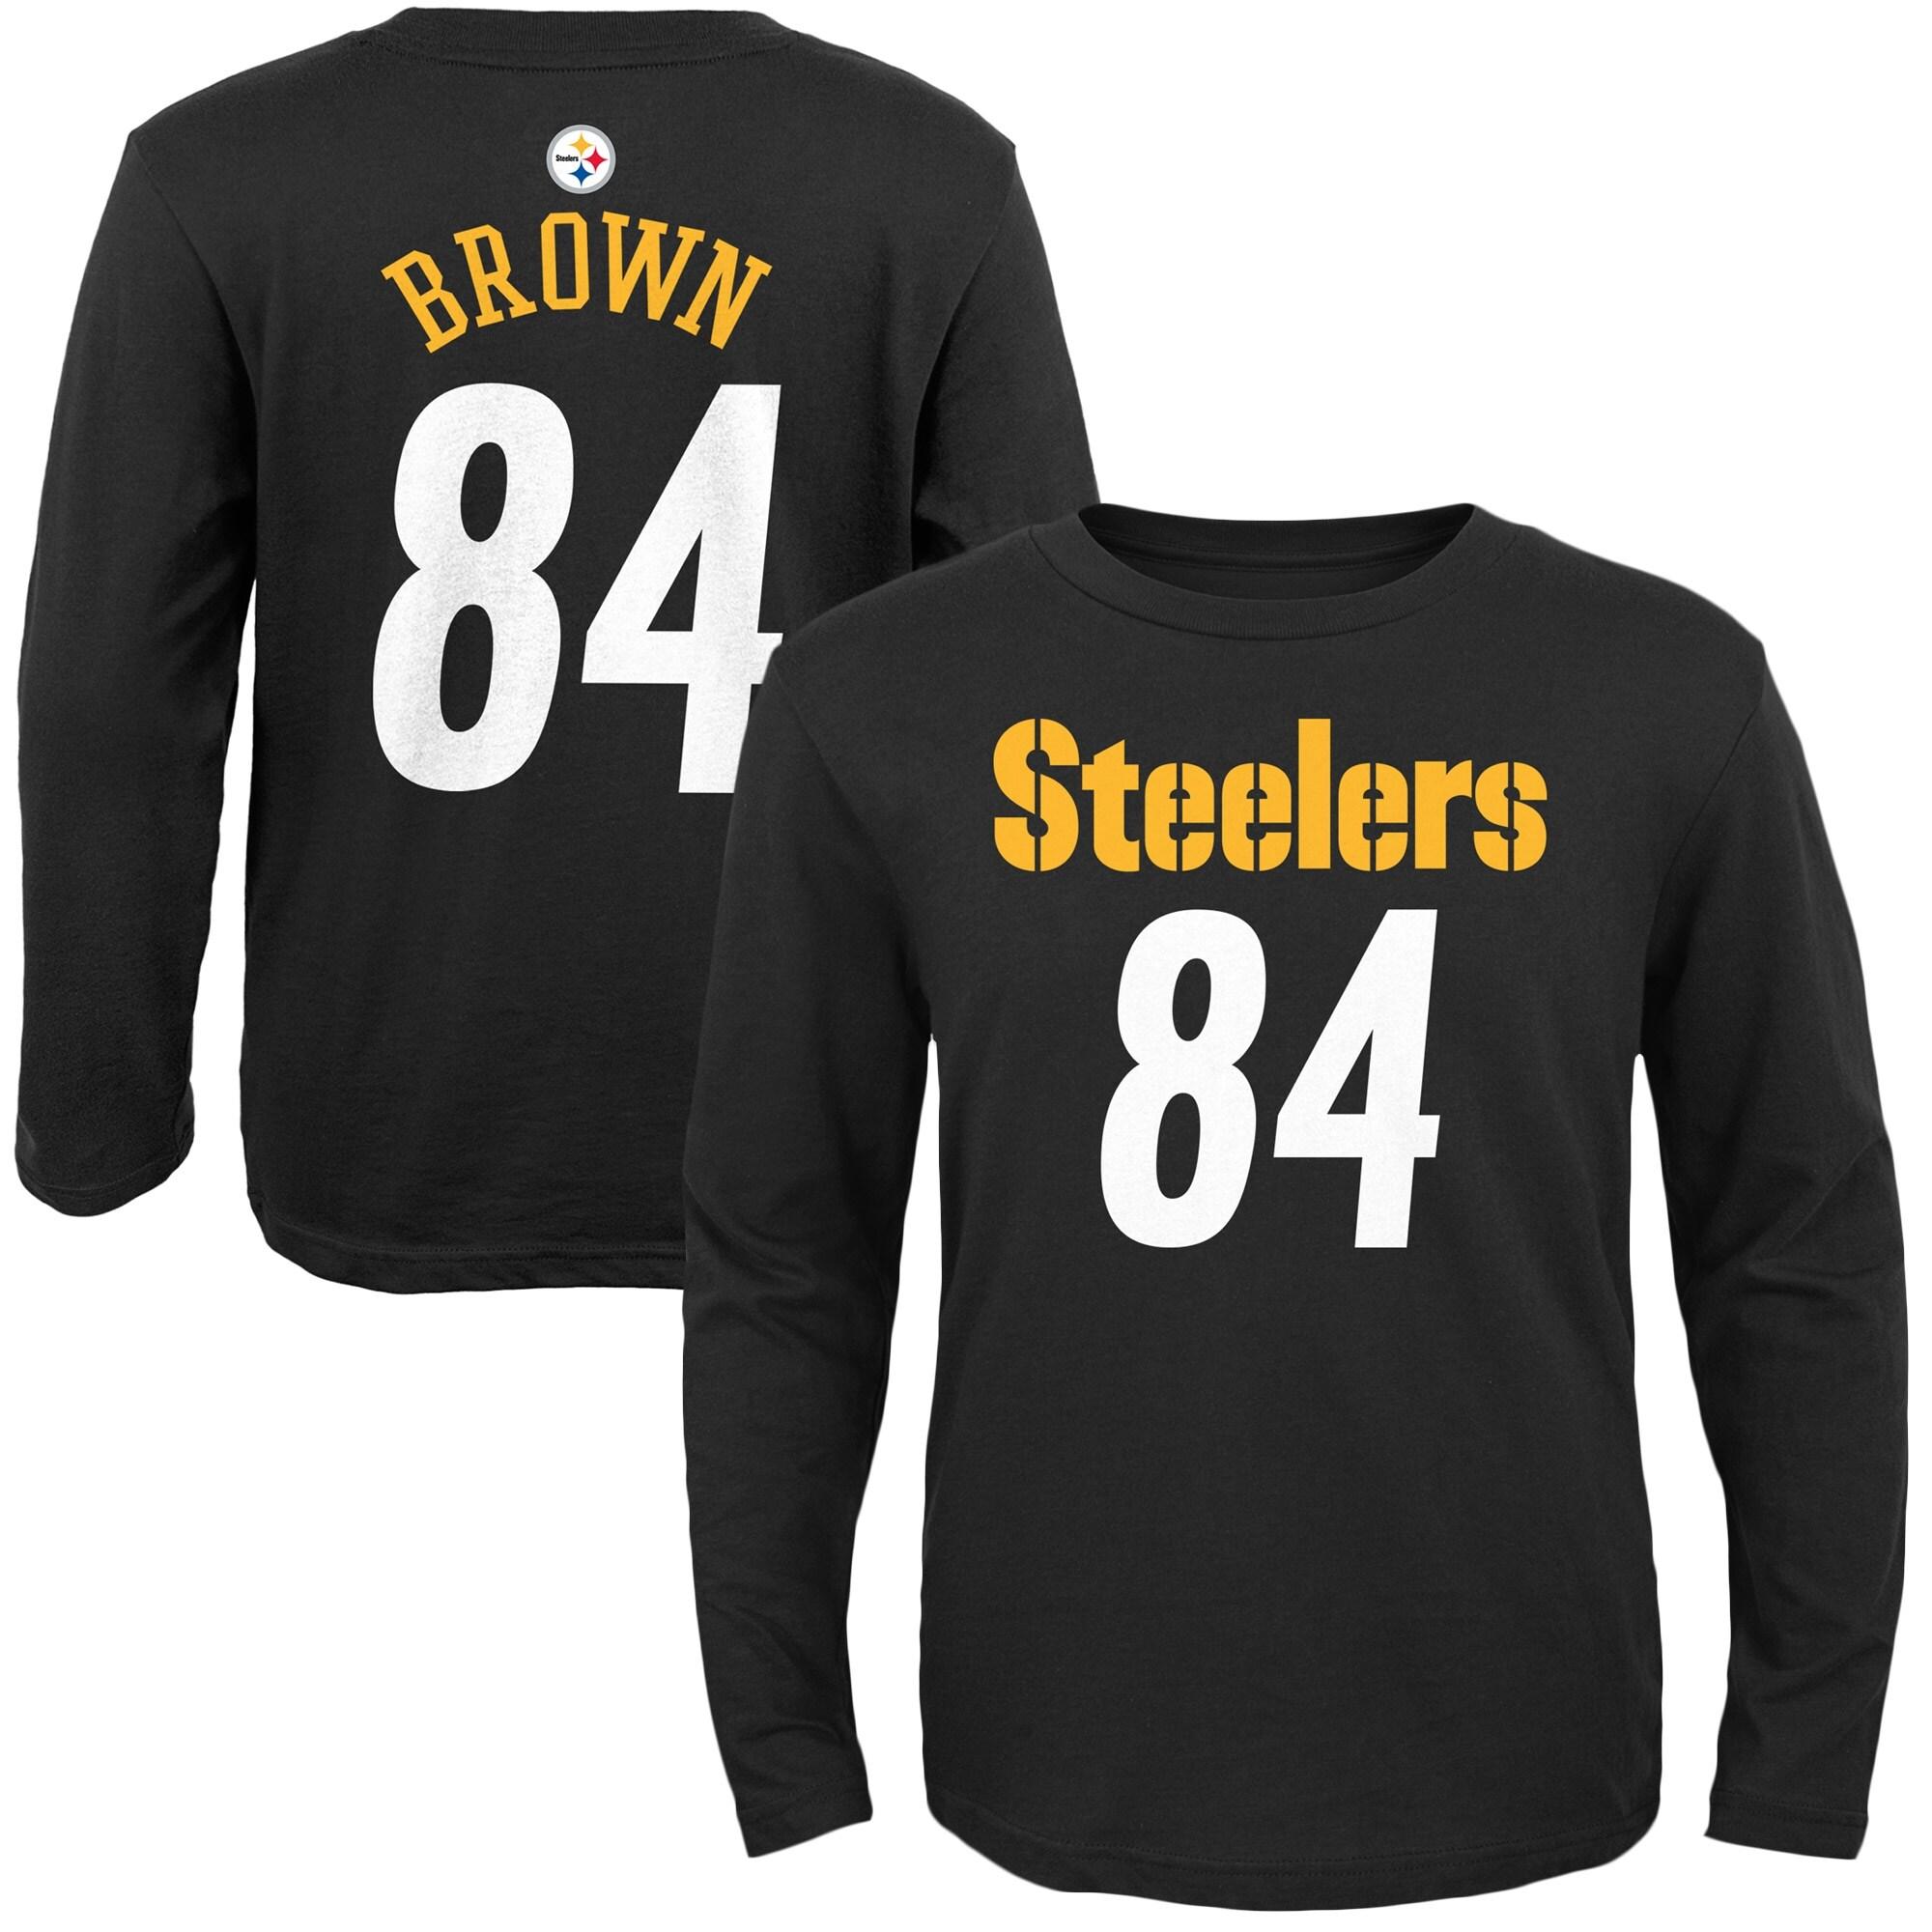 Antonio Brown Pittsburgh Steelers Youth Primary Gear Name & Number Long Sleeve T-Shirt - Black